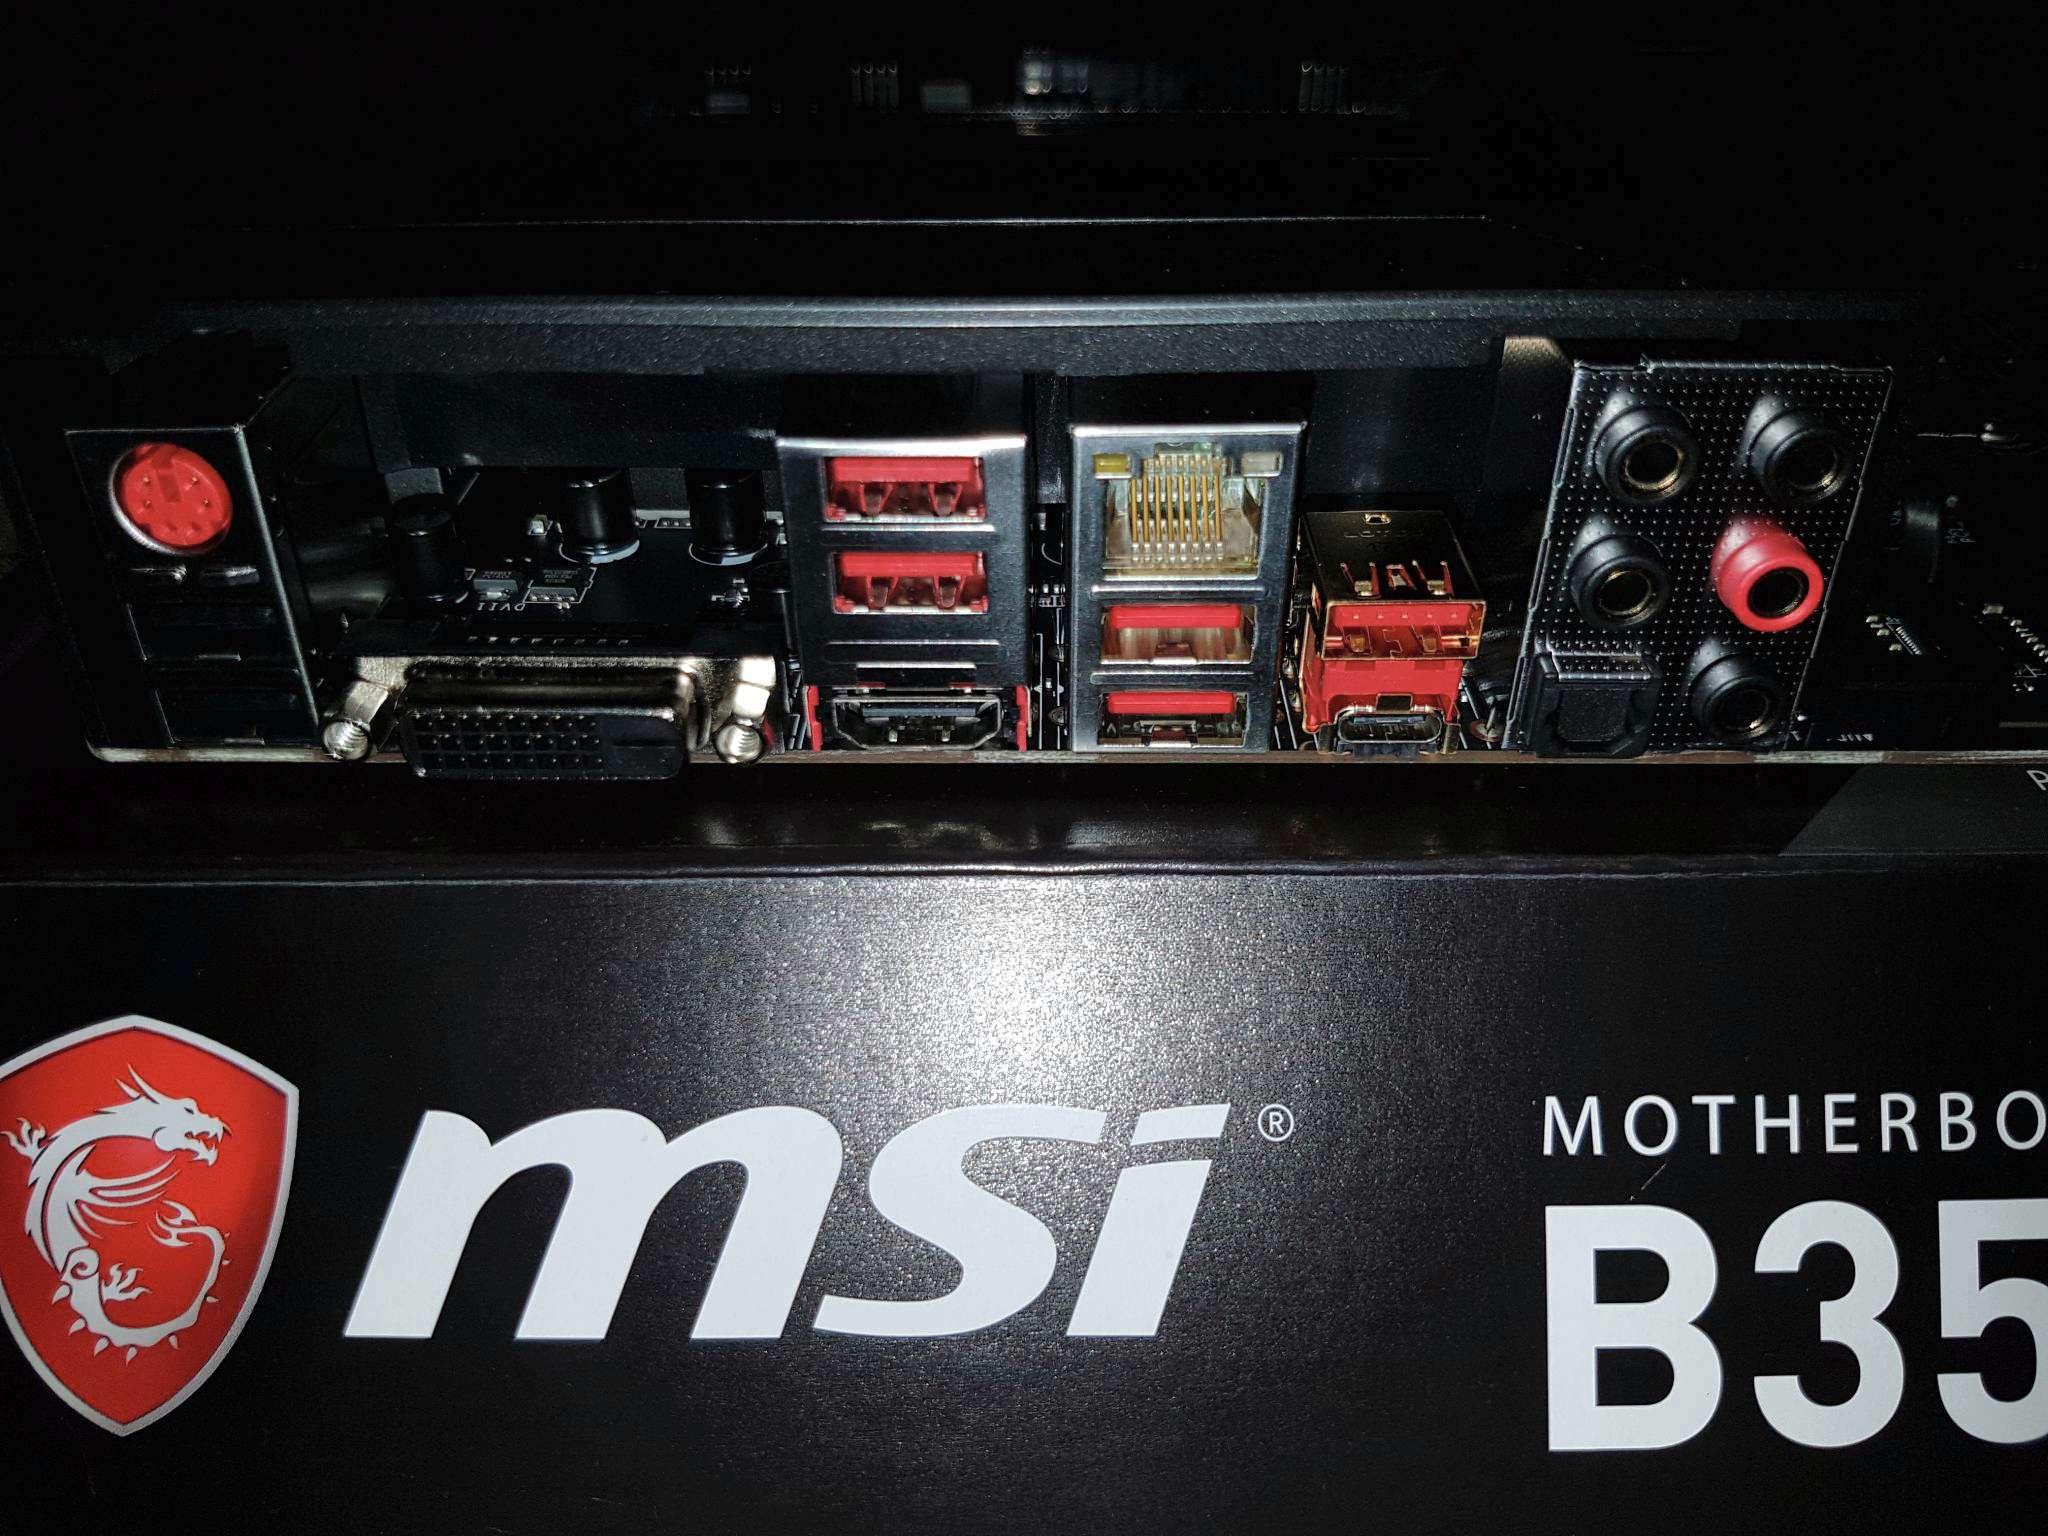 materinskaya plata msi b350 gaming pro carbon am4 atx 1 materinskaya plata msi b350 gaming pro carbon am4 atx 1